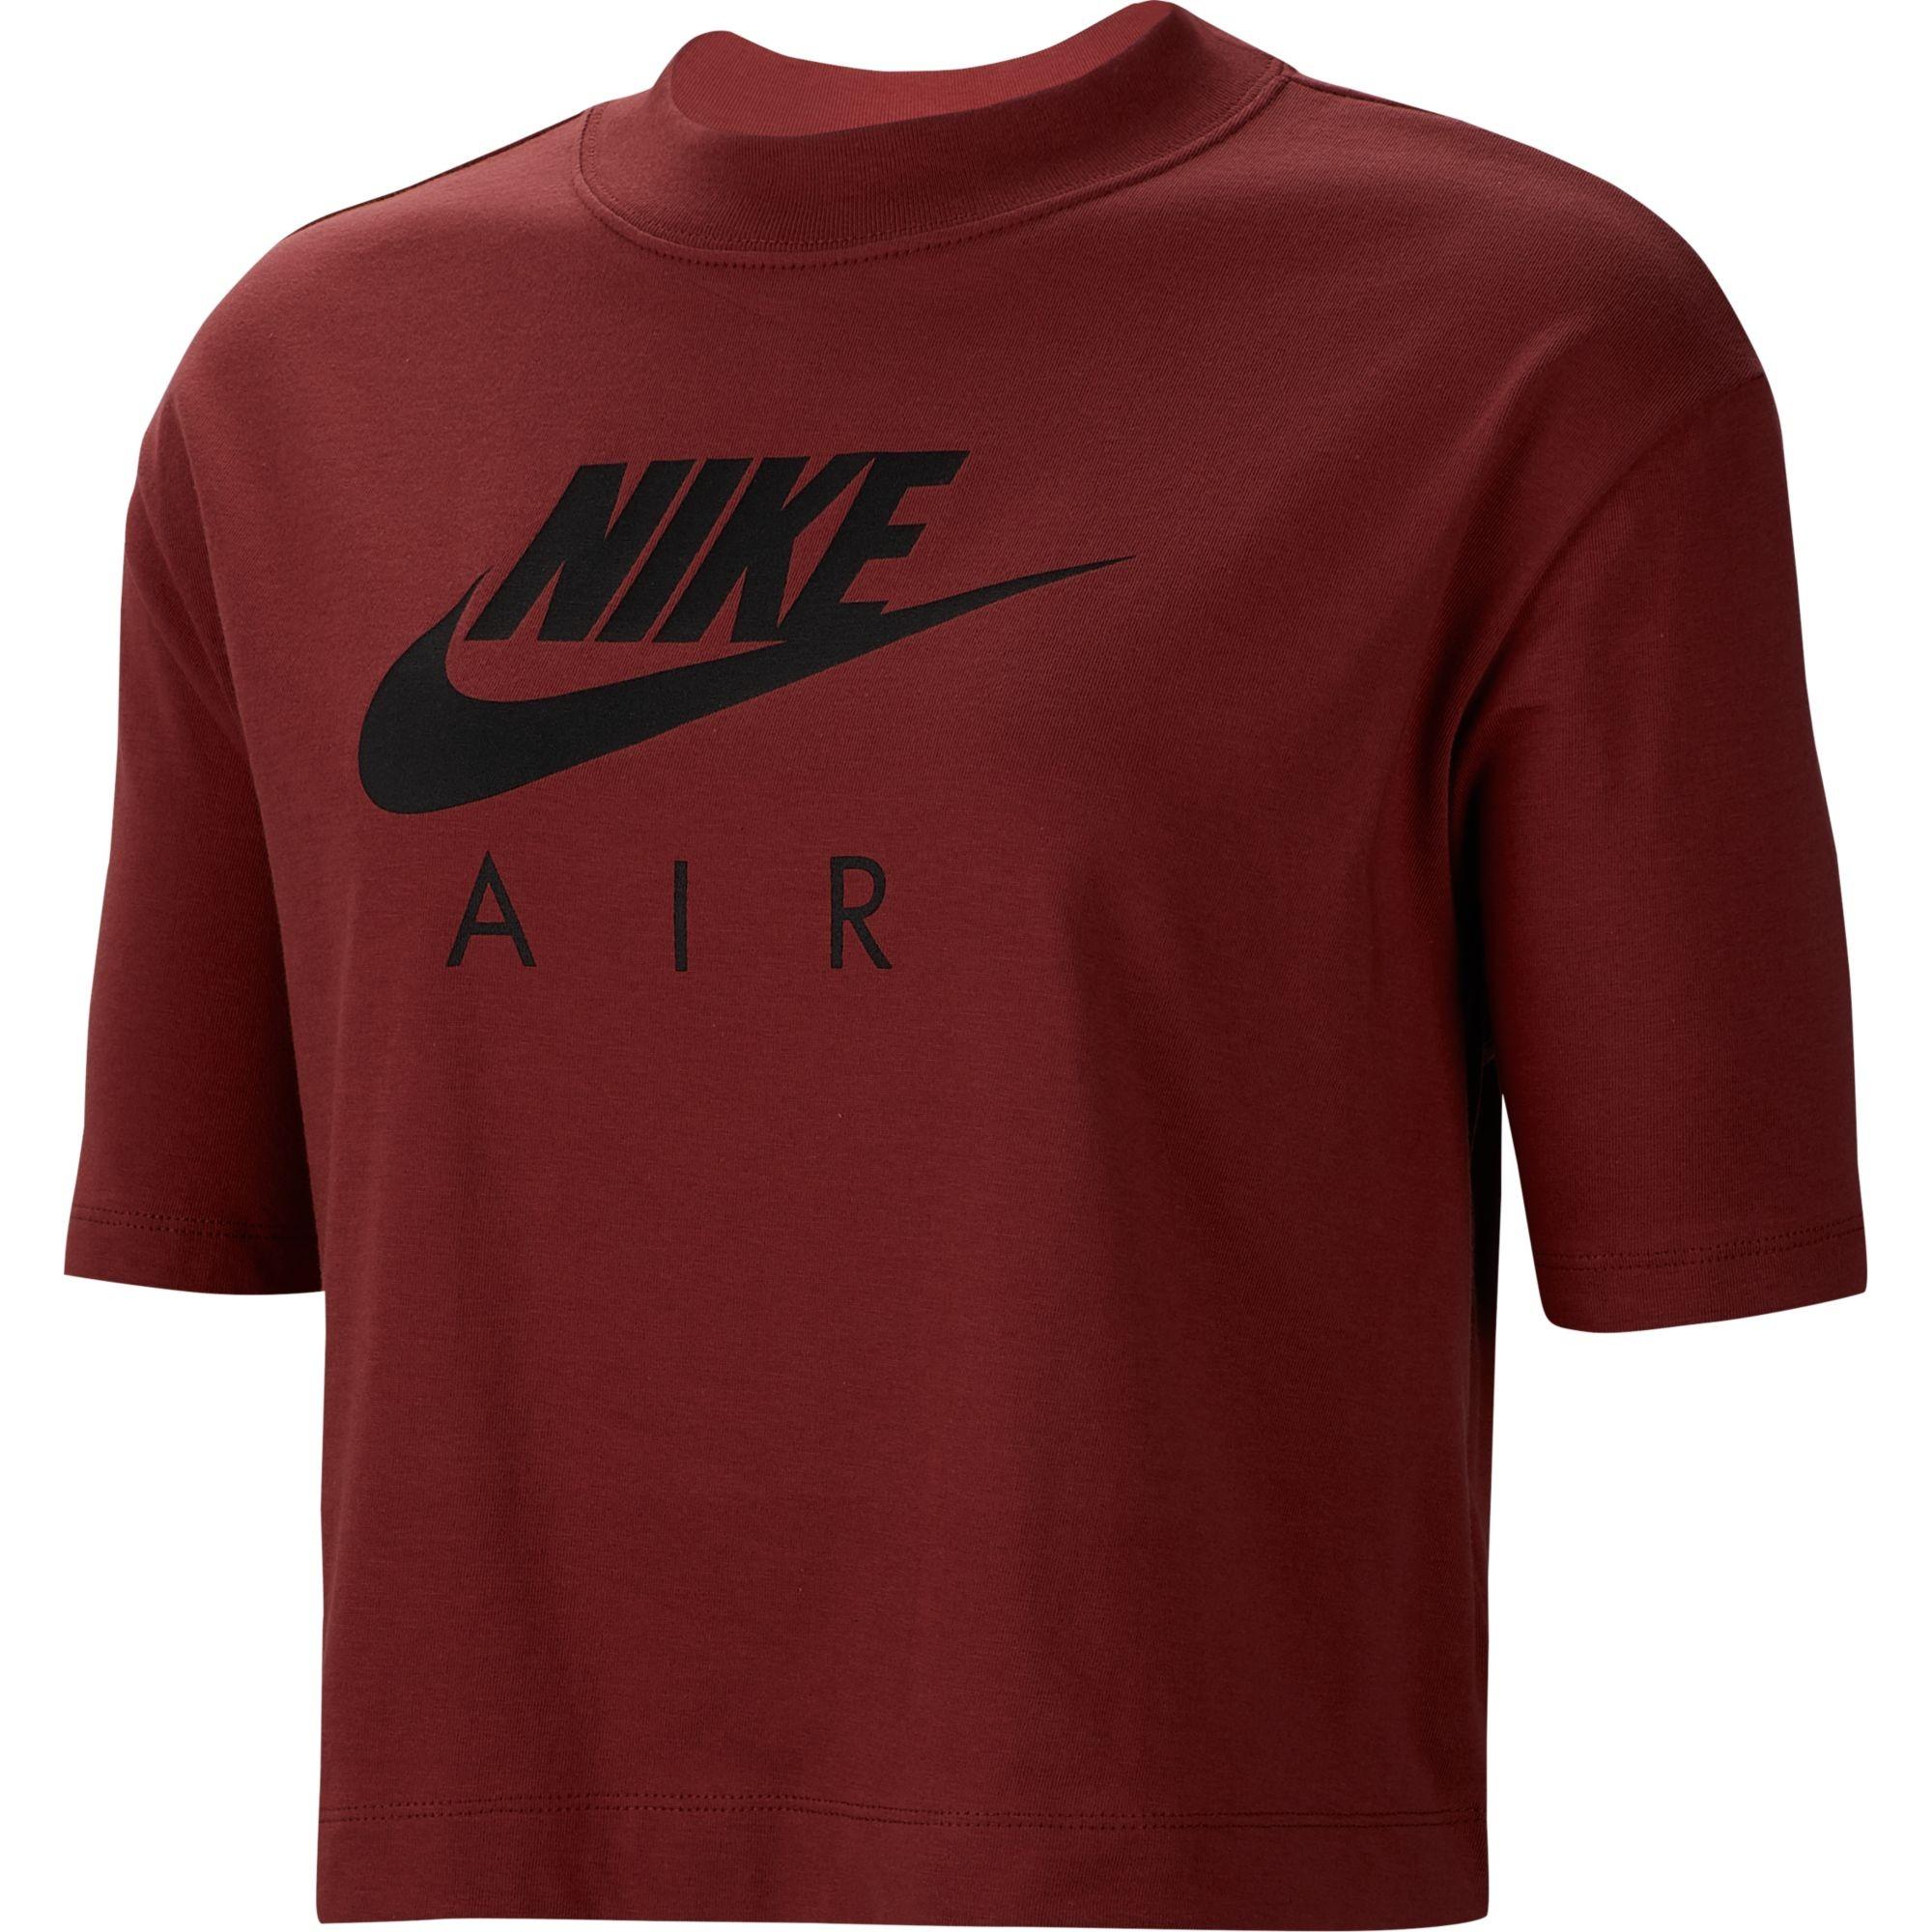 primera vista mejores zapatos ahorros fantásticos Camiseta Nike Air Women Short BV4777 661 - Deportes Manzanedo